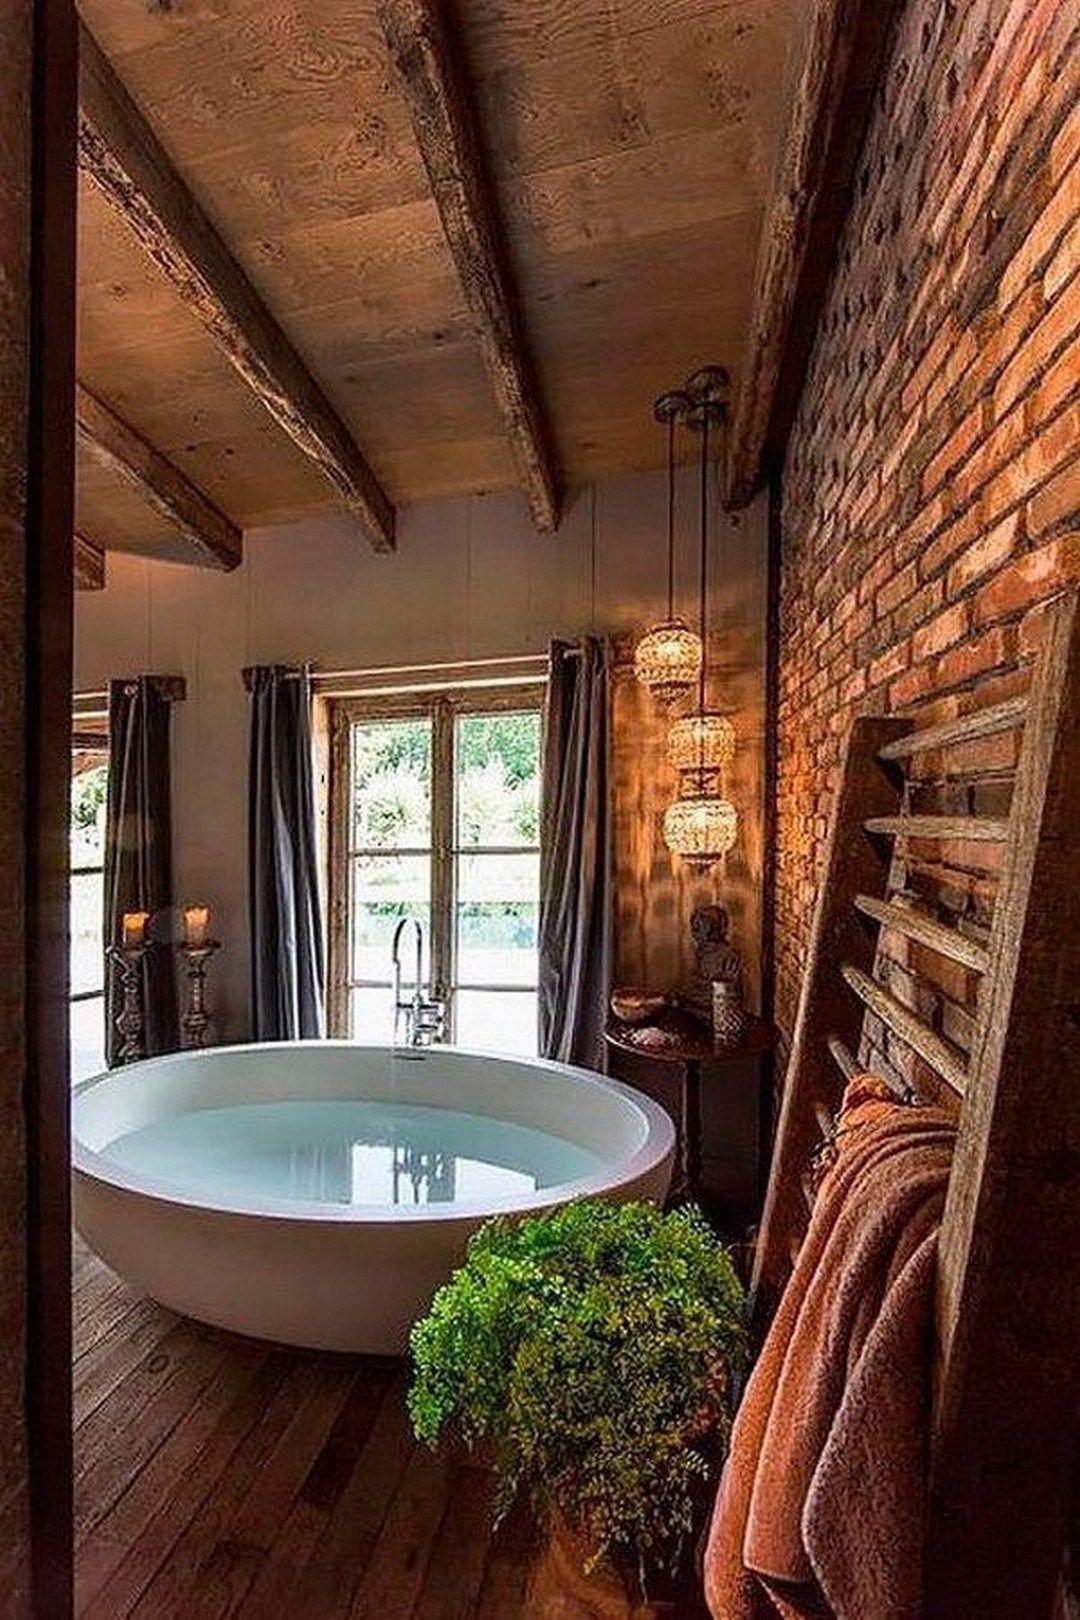 DIY Rustic Bathroom Decorating Ideas 50 Gorgeous Photos ...